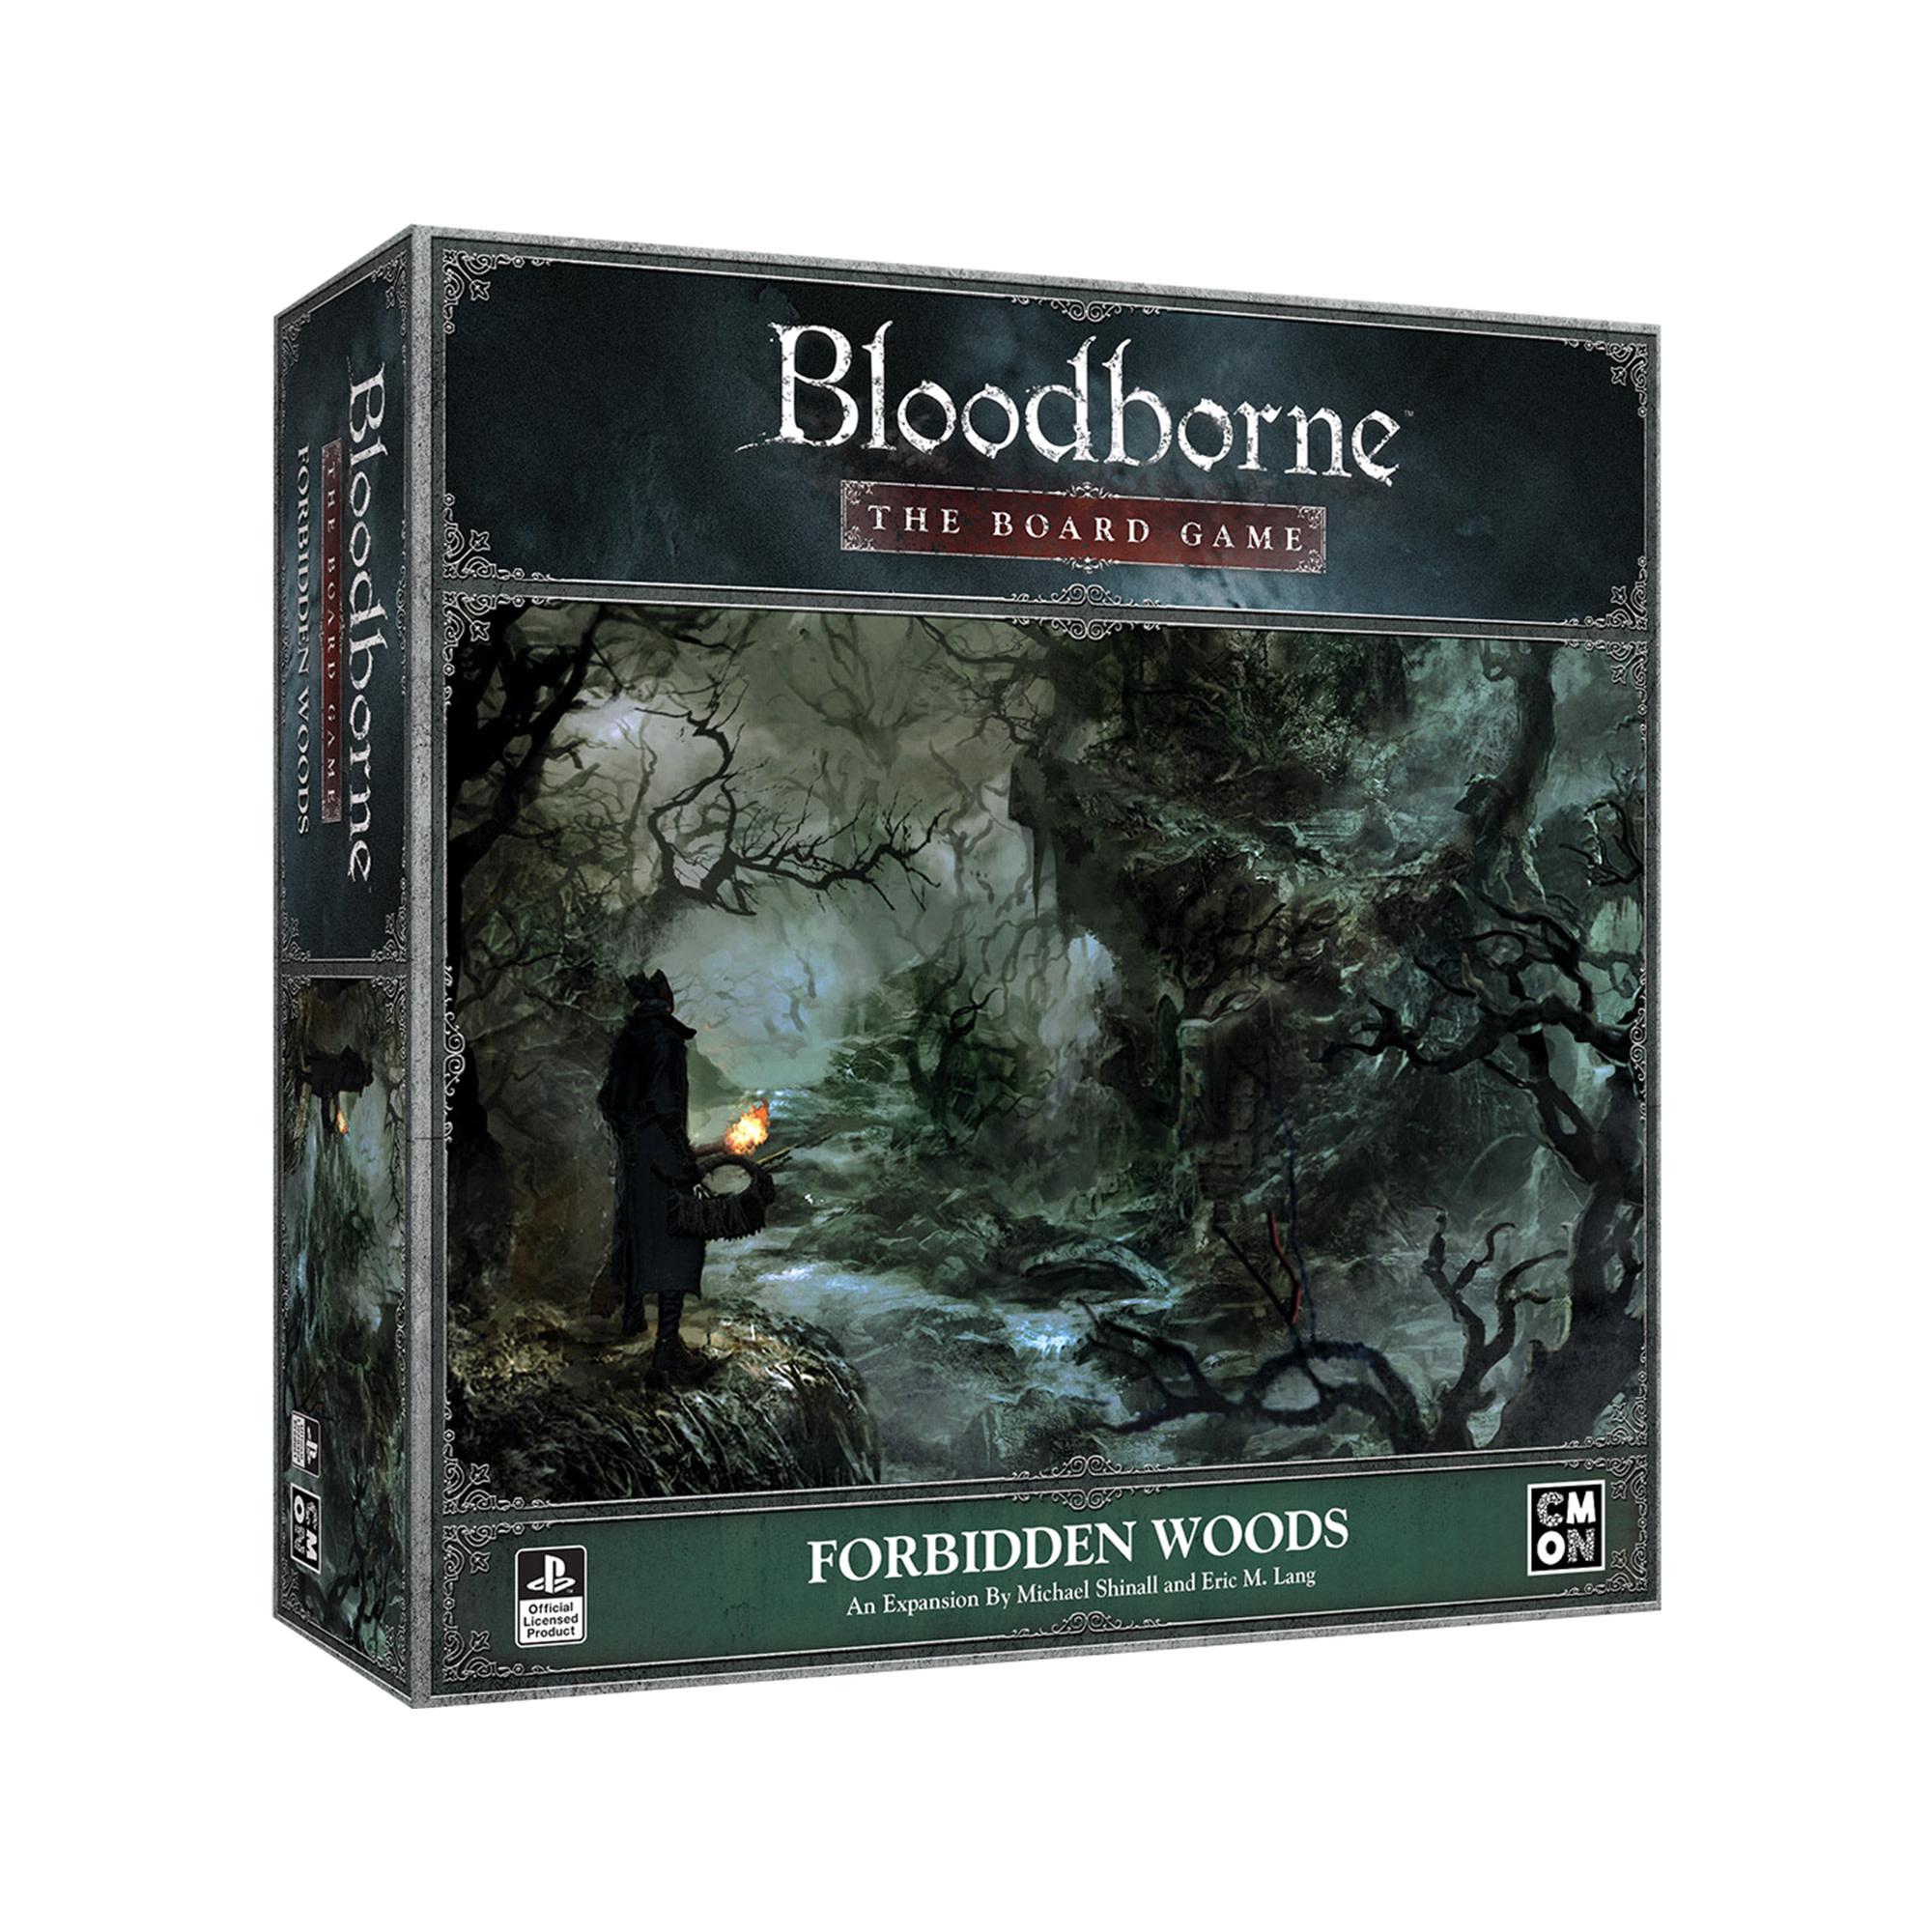 Bloodborne: The Board Game - Forbidden Woods Exp. (EN) (Retail Edition)